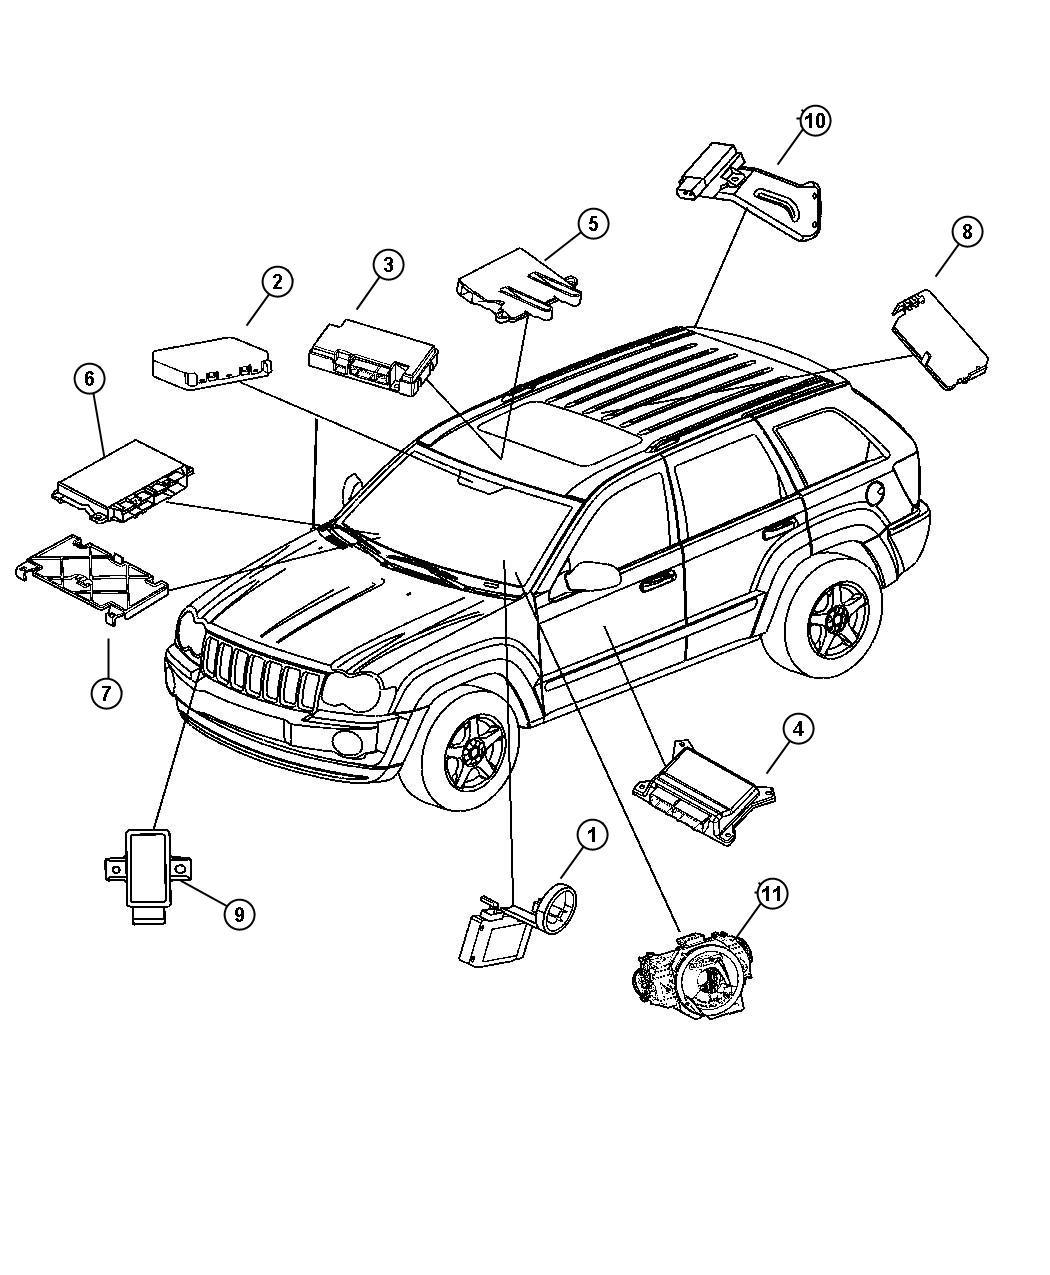 2005 Jeep Grand Cherokee Module. Steering control